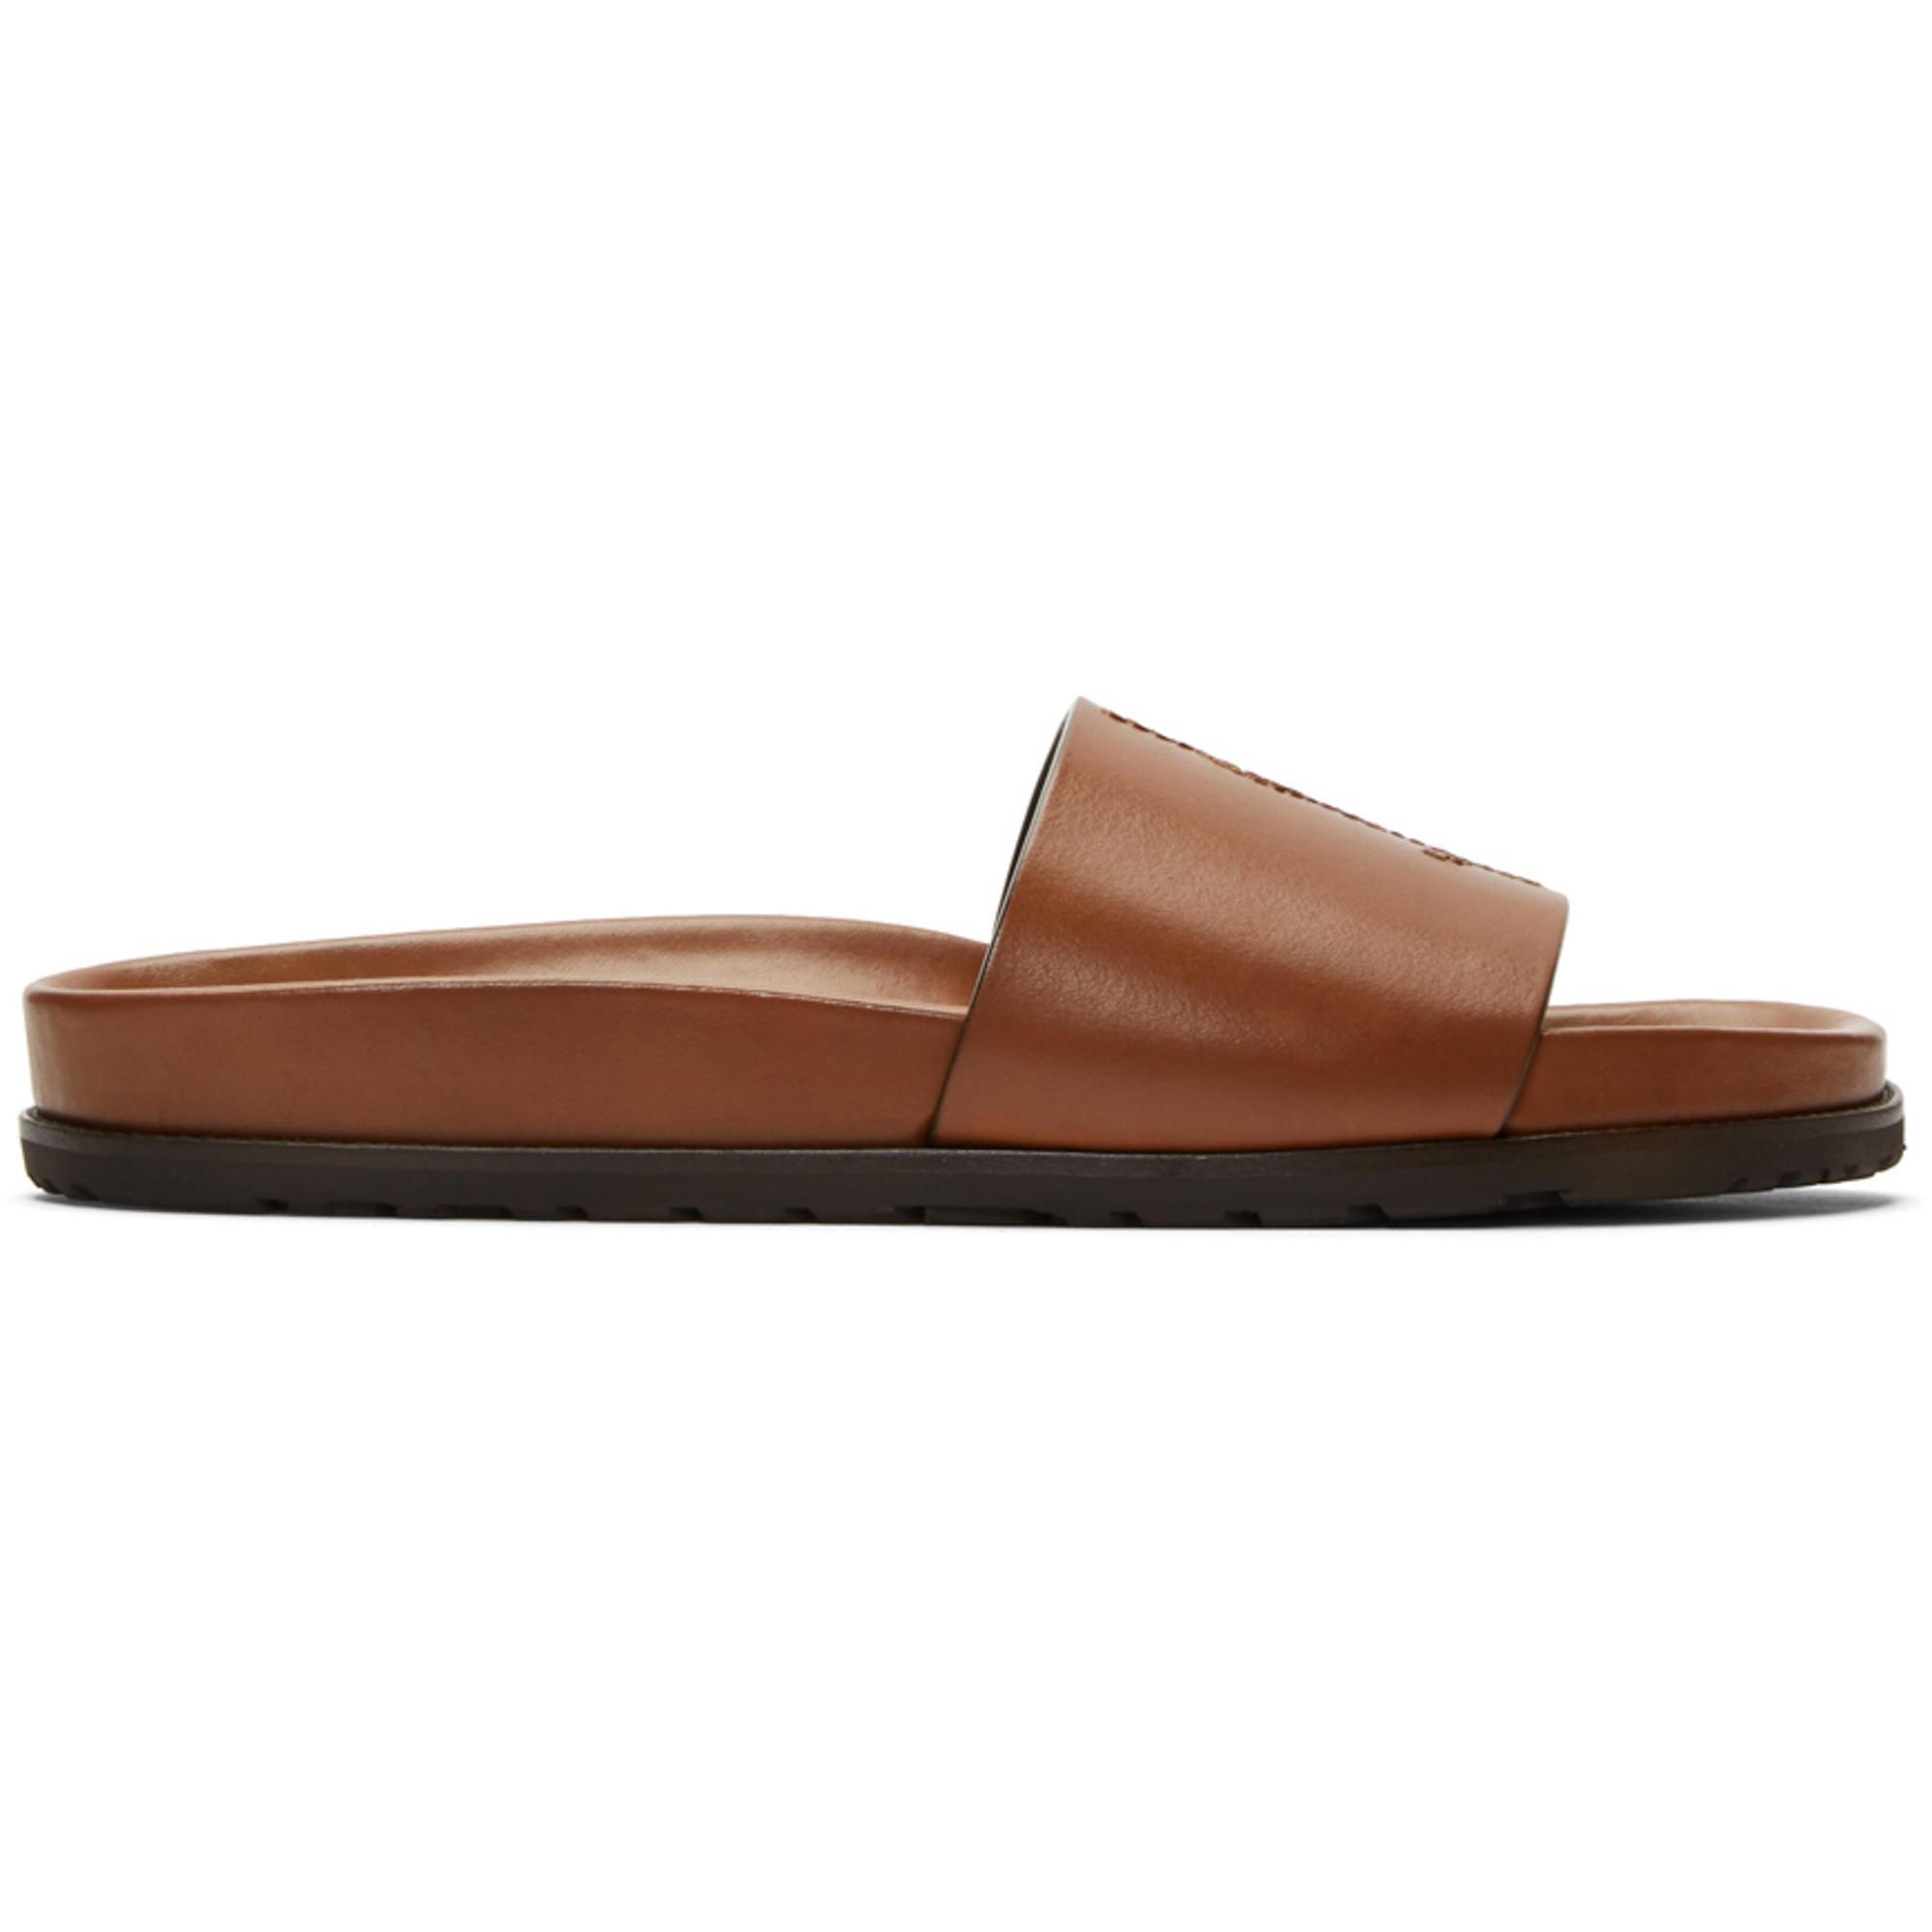 Saint Laurent Jimmy Slide Sandals Cheap Get To Buy Best Online Factory Outlet Cheap Geniue Stockist FSwDe